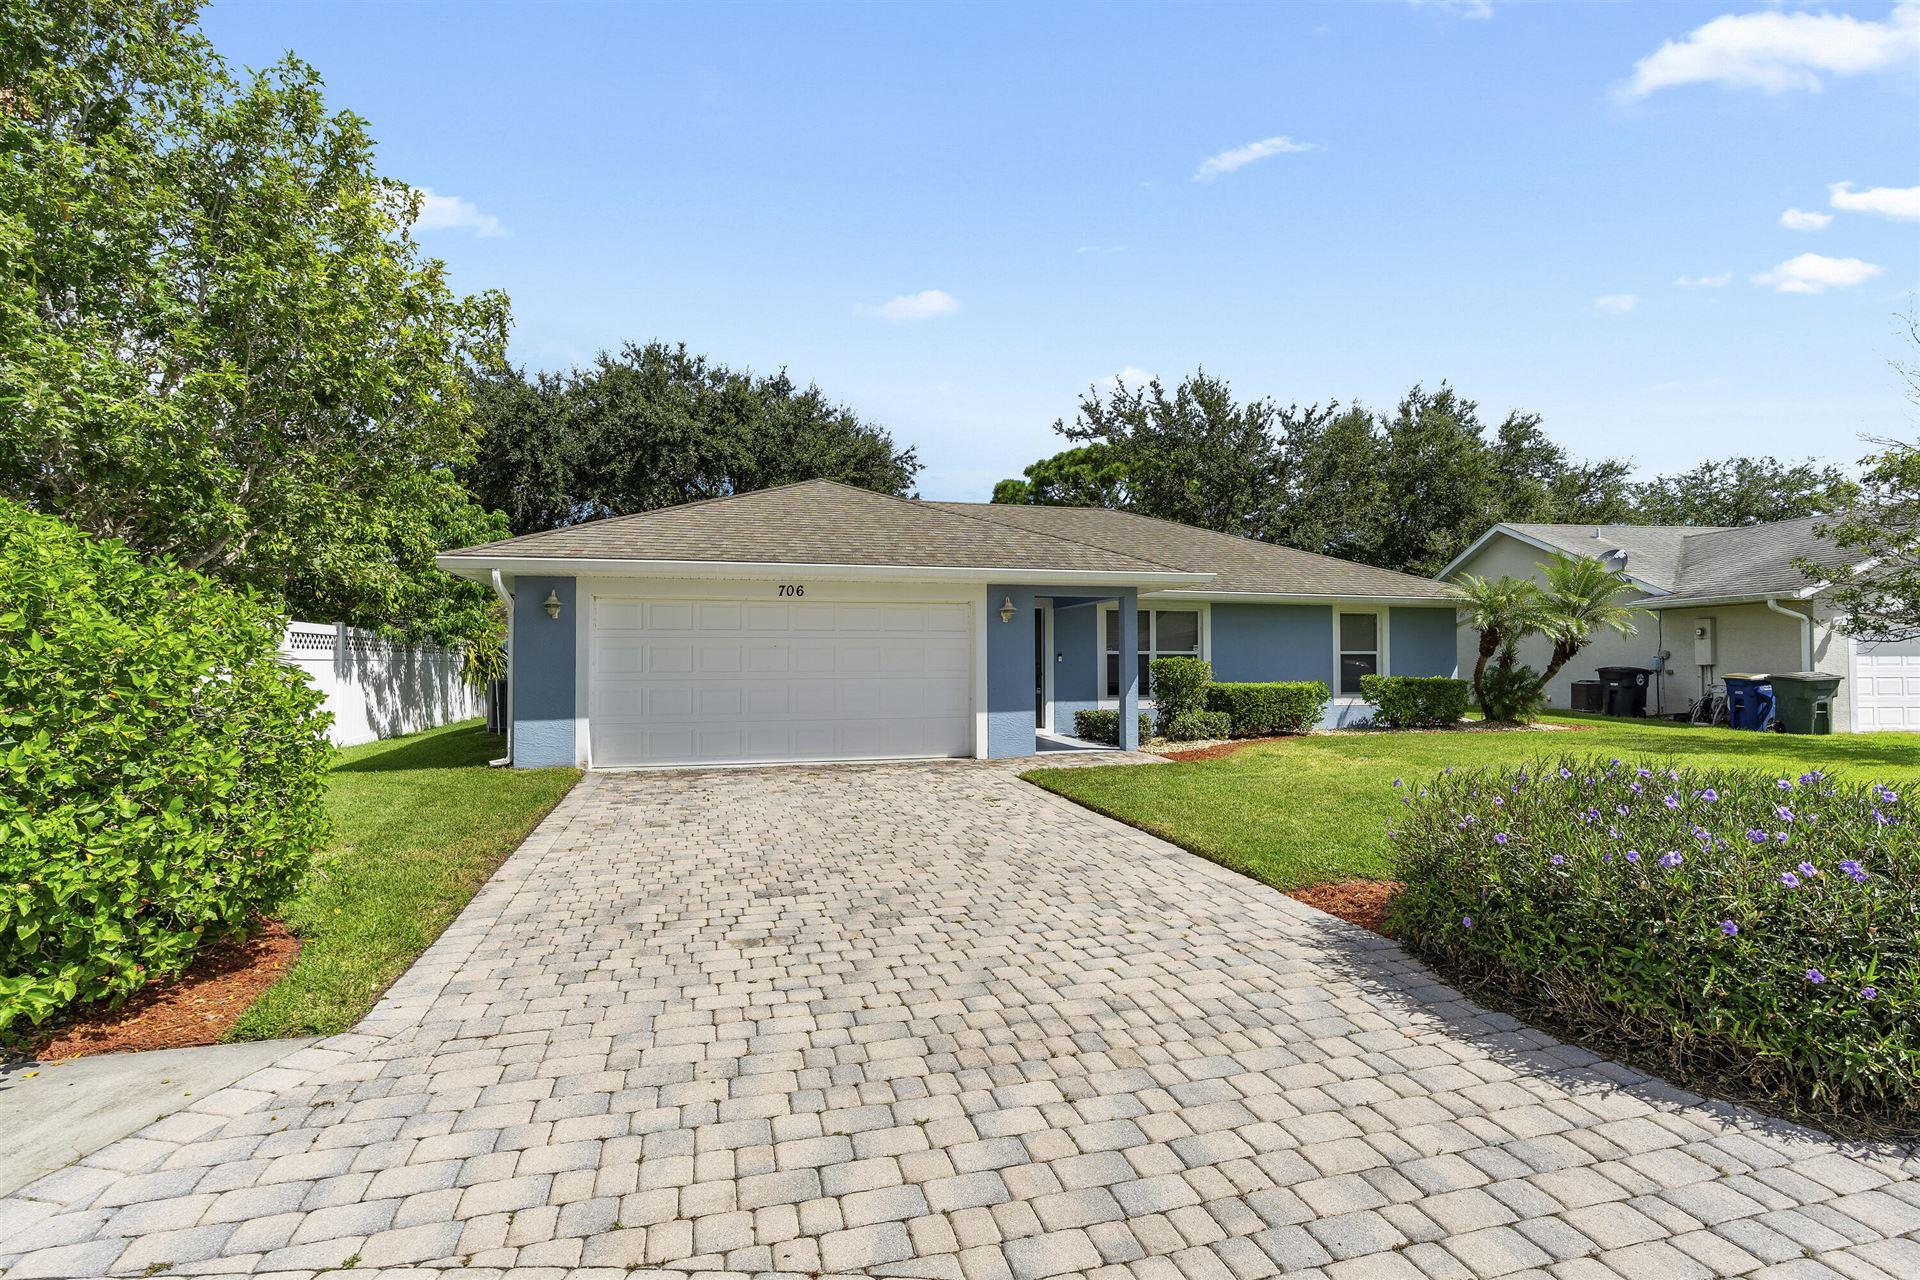 706 Osceola Avenue, Fort Pierce, FL 34982 - #: RX-10746393